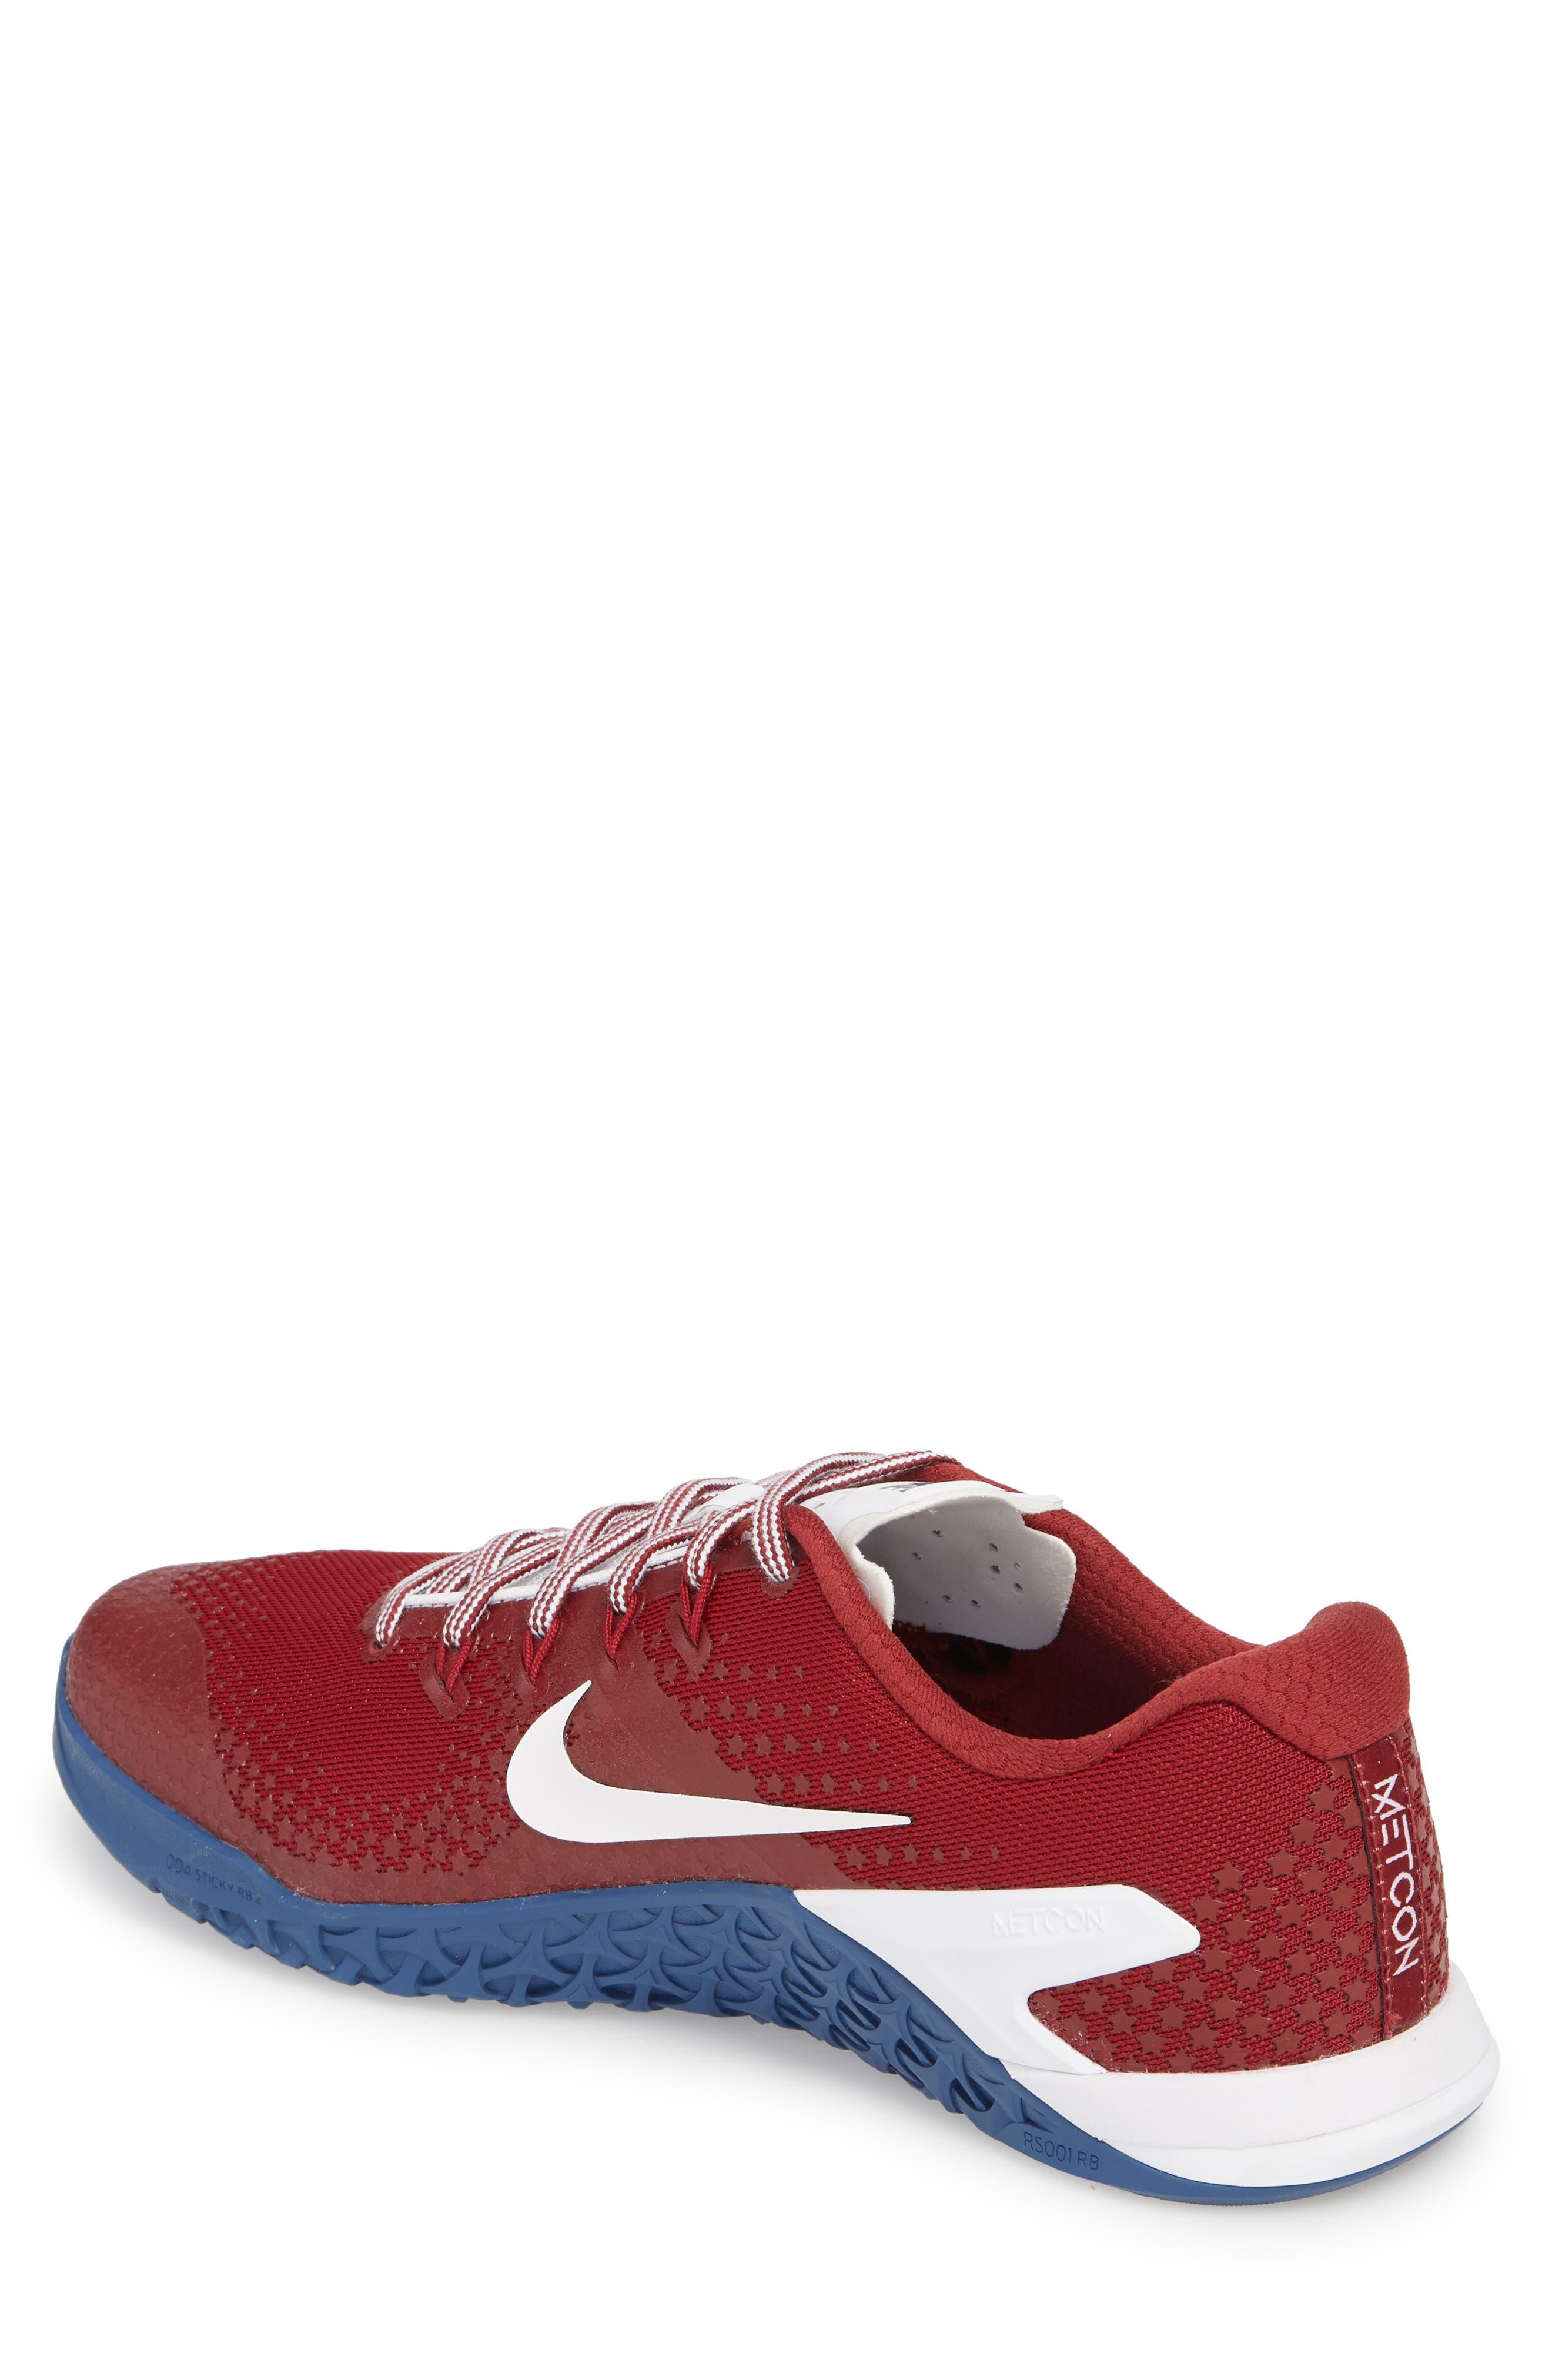 Metcon 4 Americana Training Shoe,                             Alternate thumbnail 2, color,                             Team Red/ White/ Gym Blue